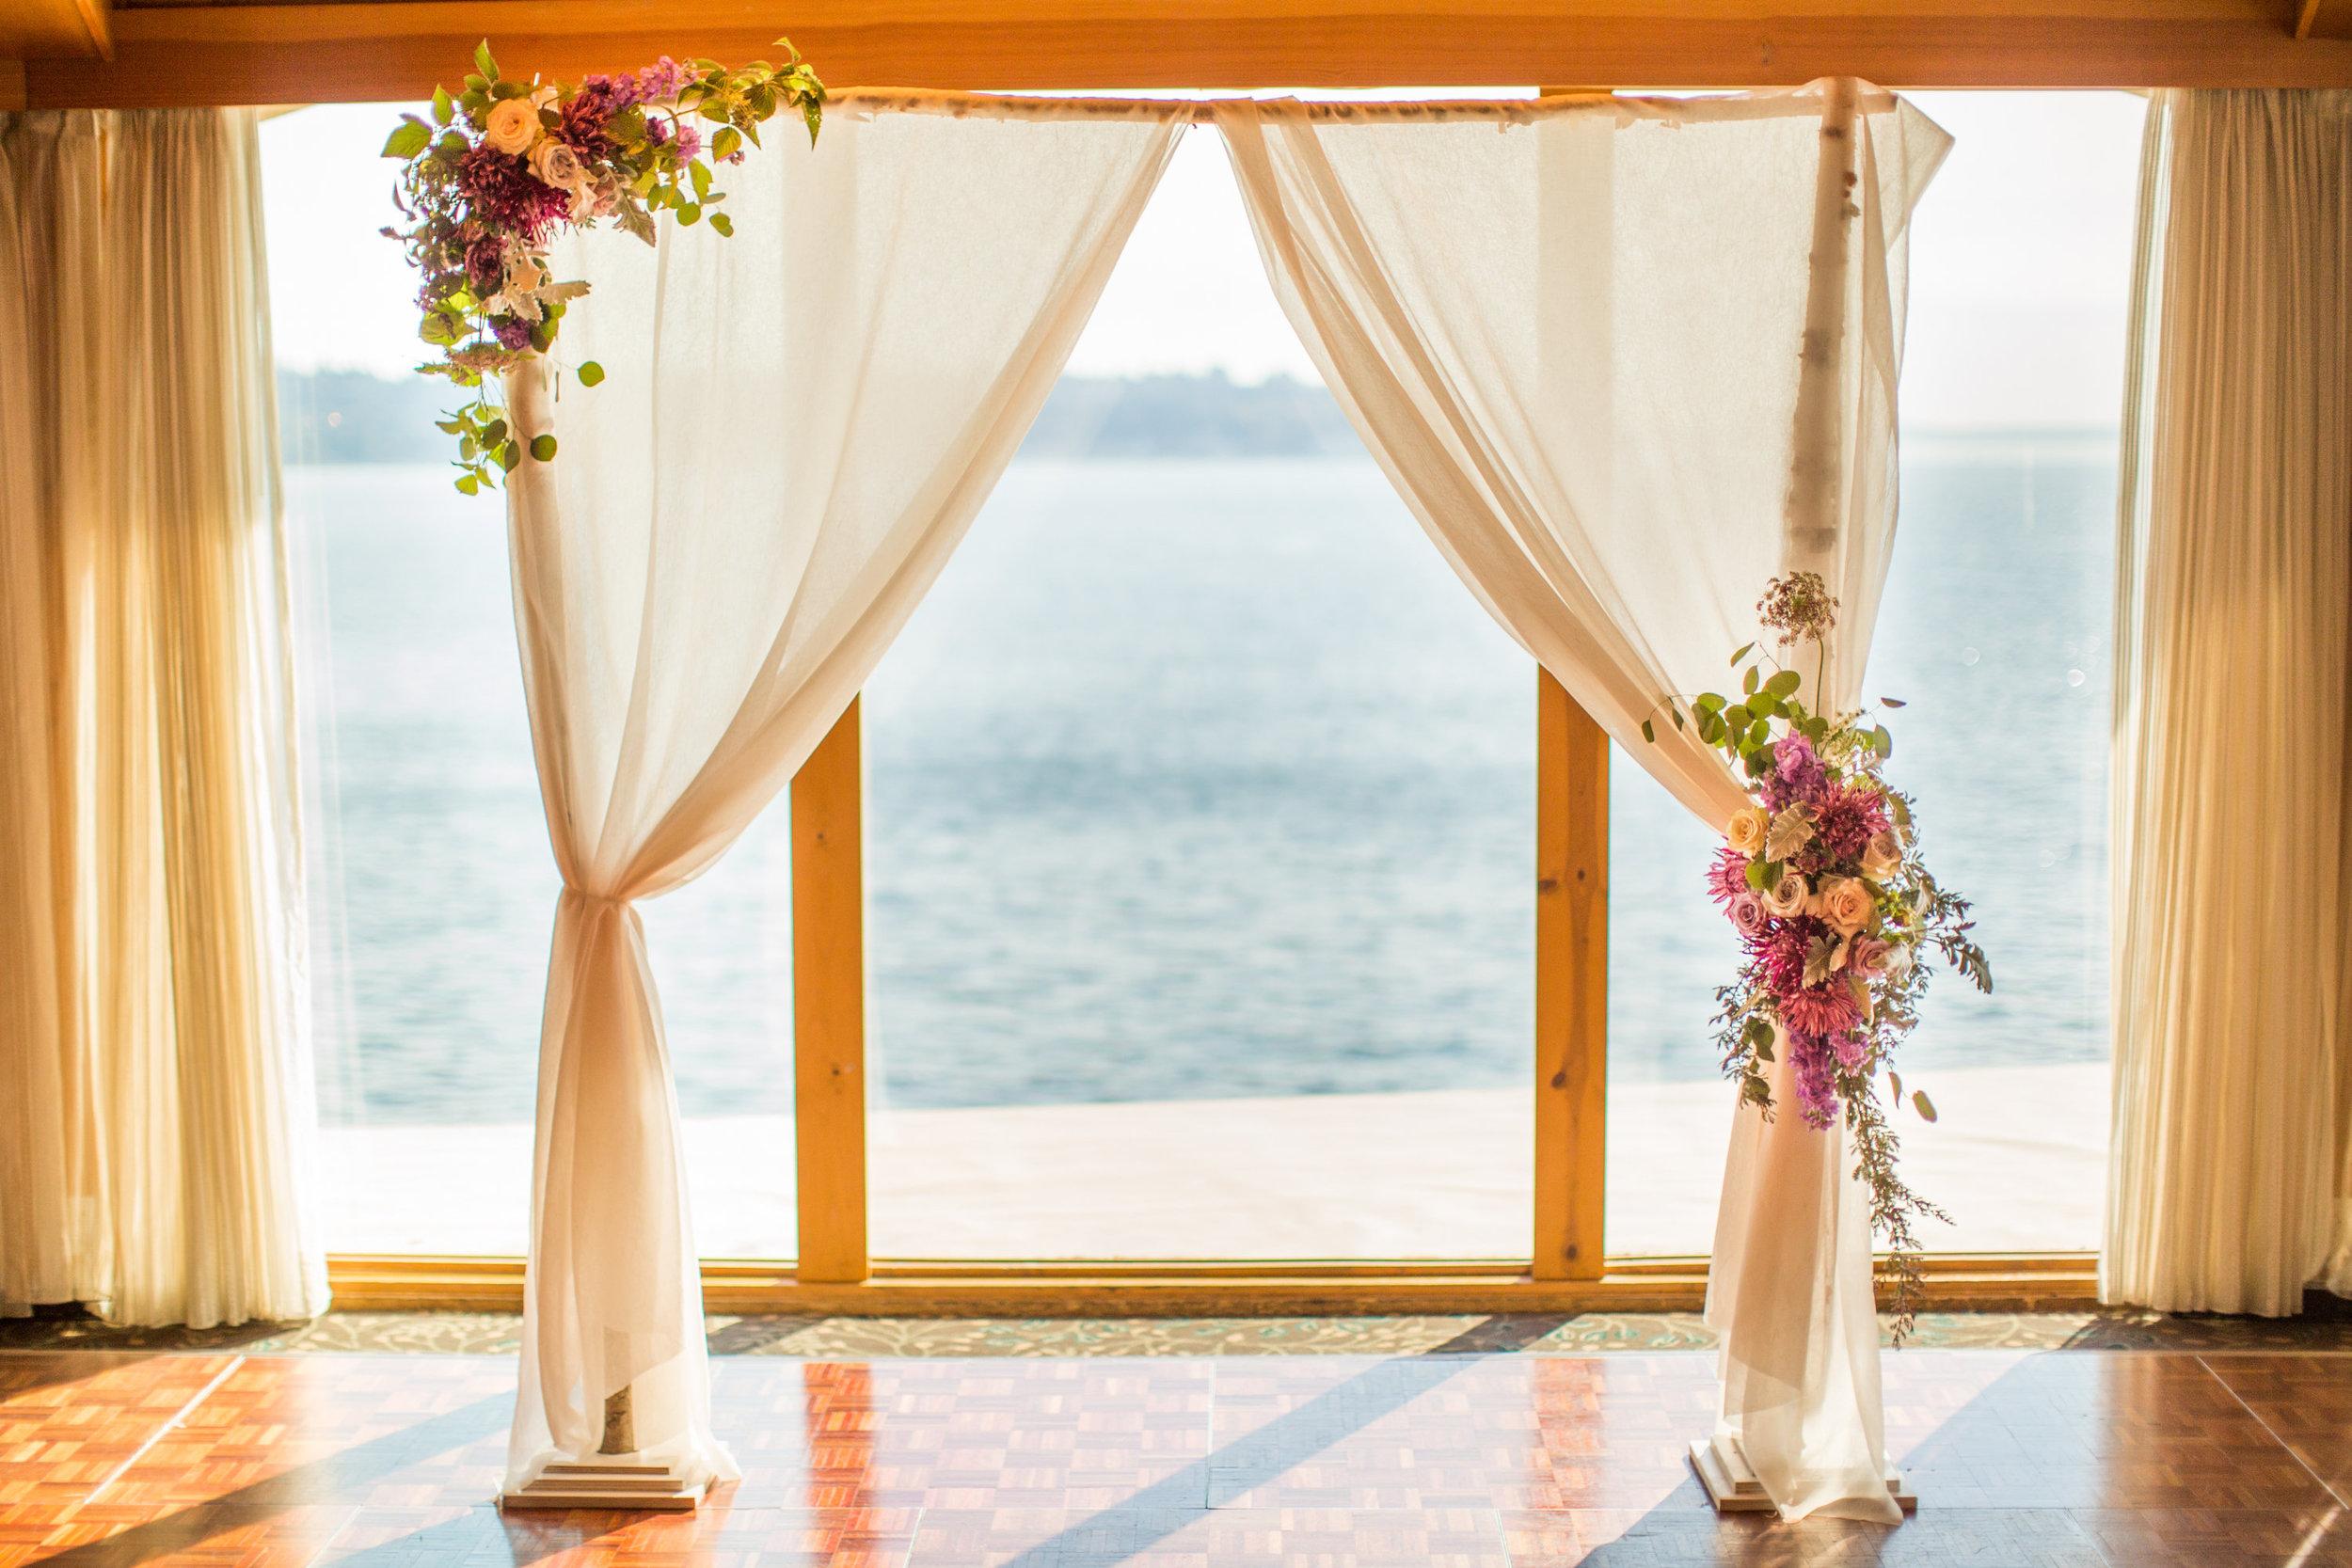 Seattle Wedding Planner, Wedding Wise | Ciccarelli Photography | Edgewater Hotel Wedding | Purple and navy blue wedding ceremony arch | Ceremony arch draping